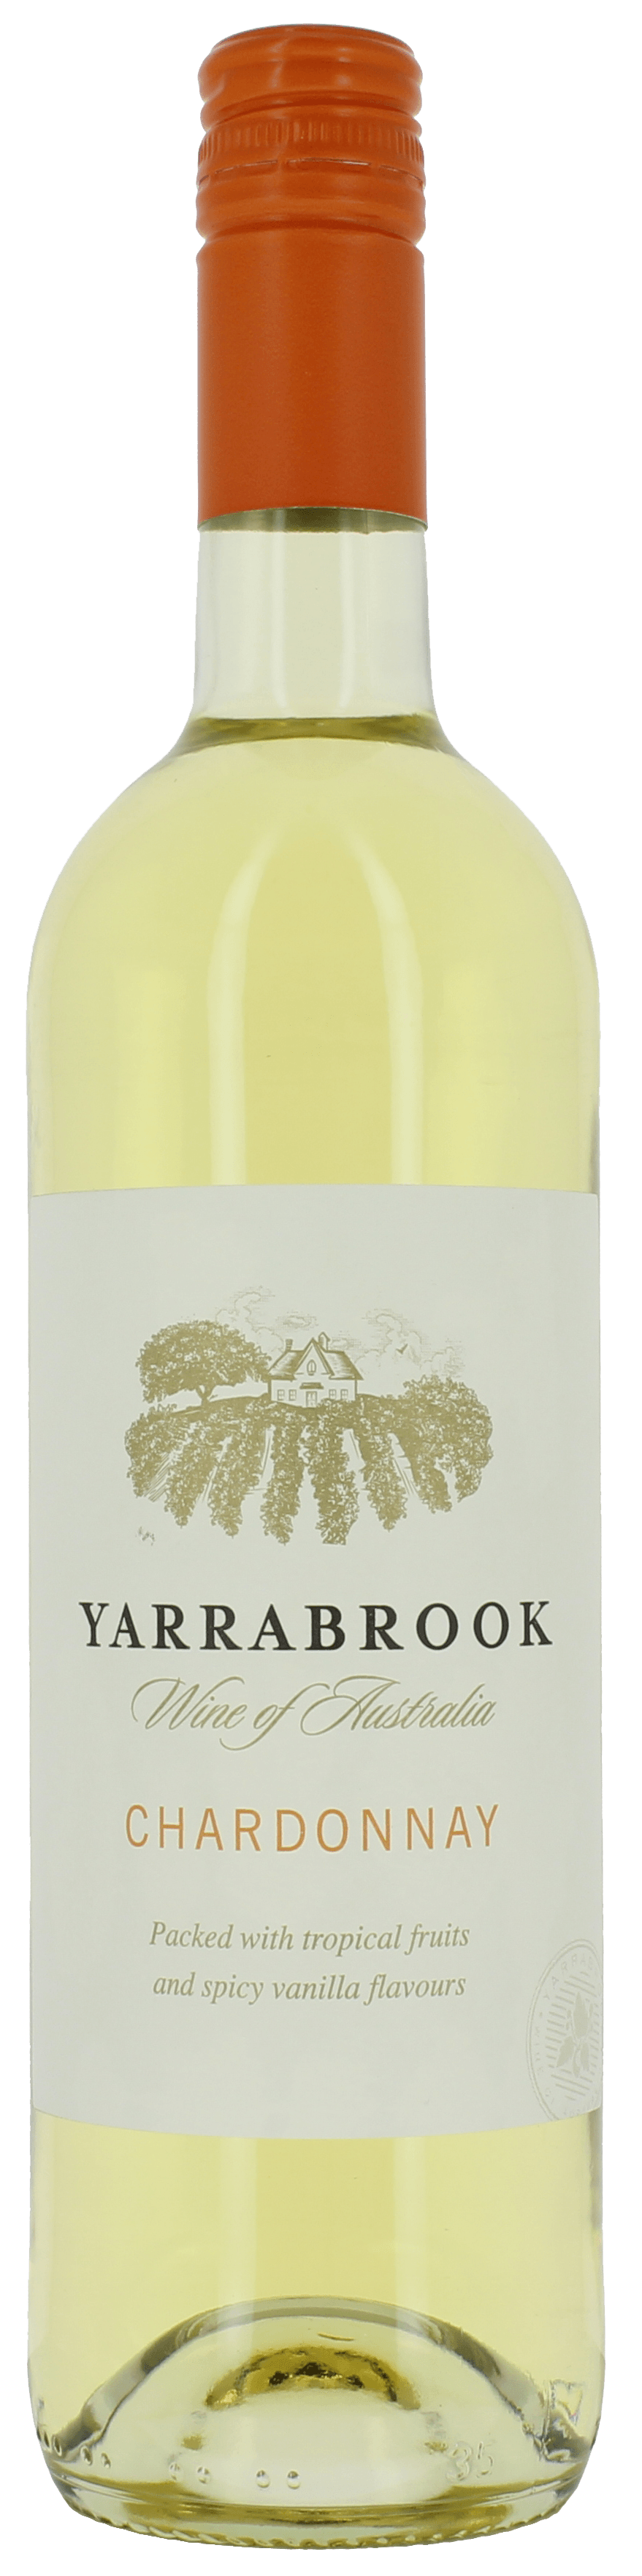 Image 0: Yarrabrook Chardonnay